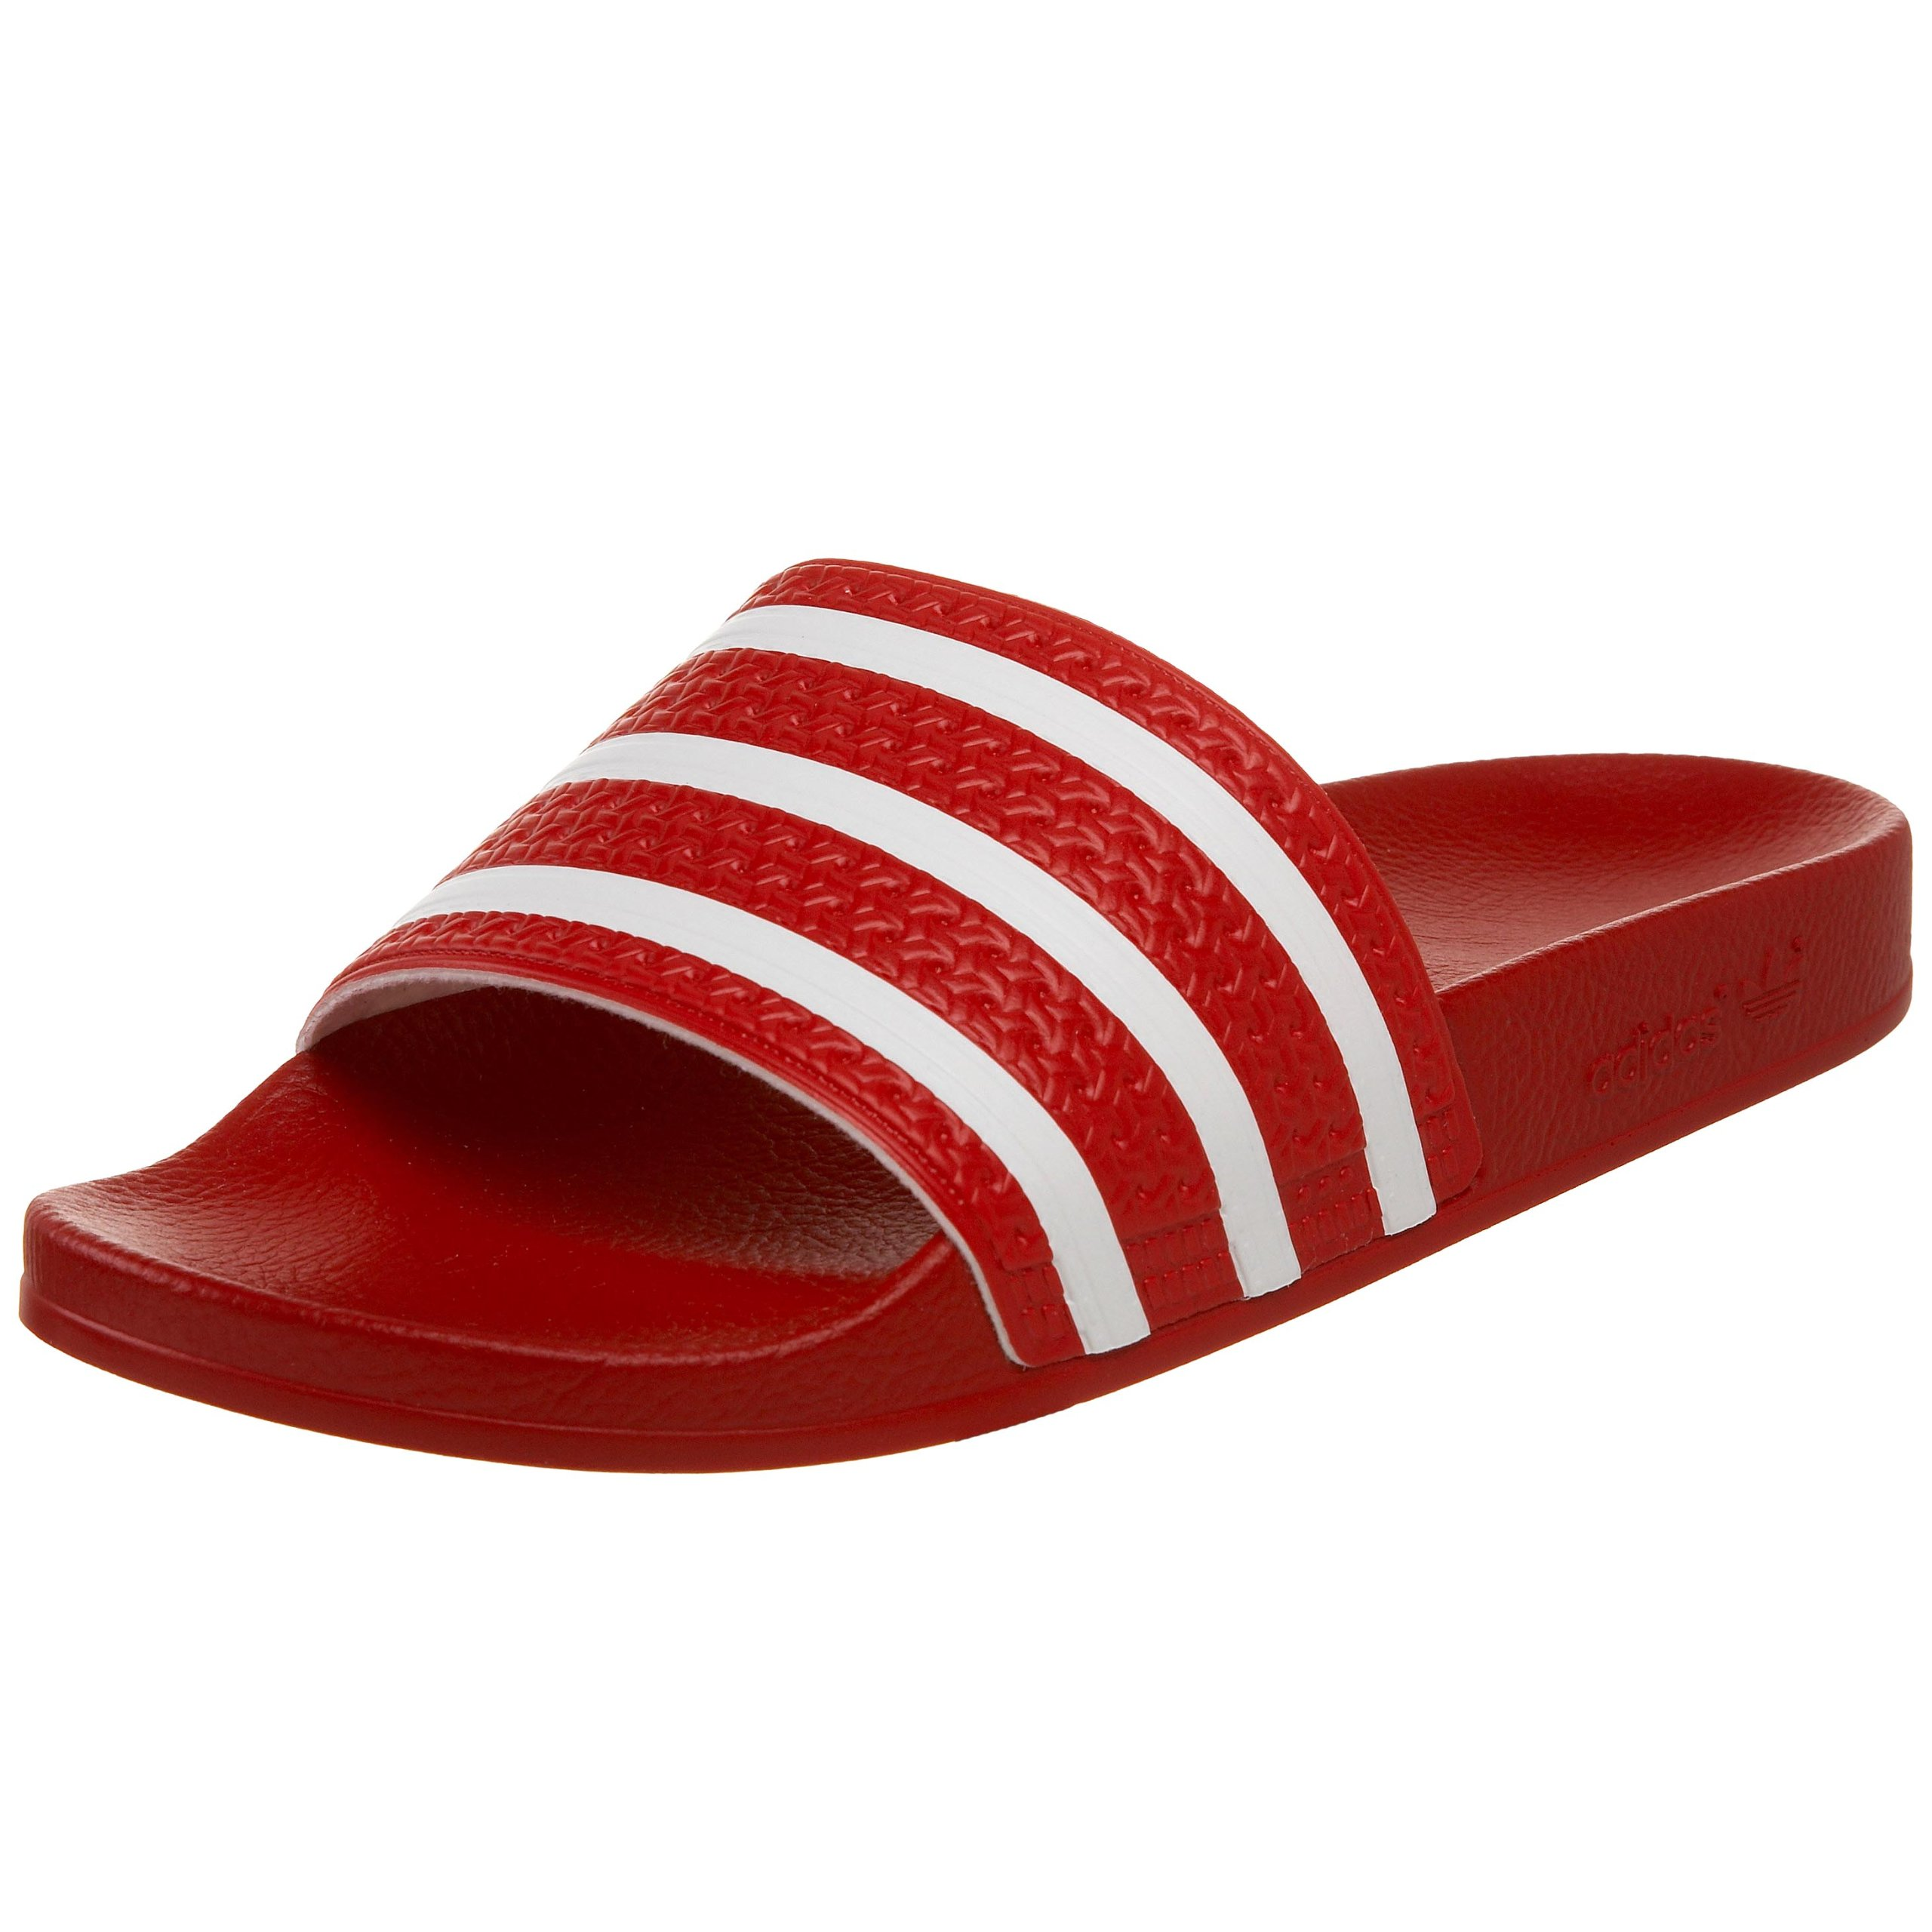 28b753f12 Galleon - Adidas Men s Adilette Slide Sandal